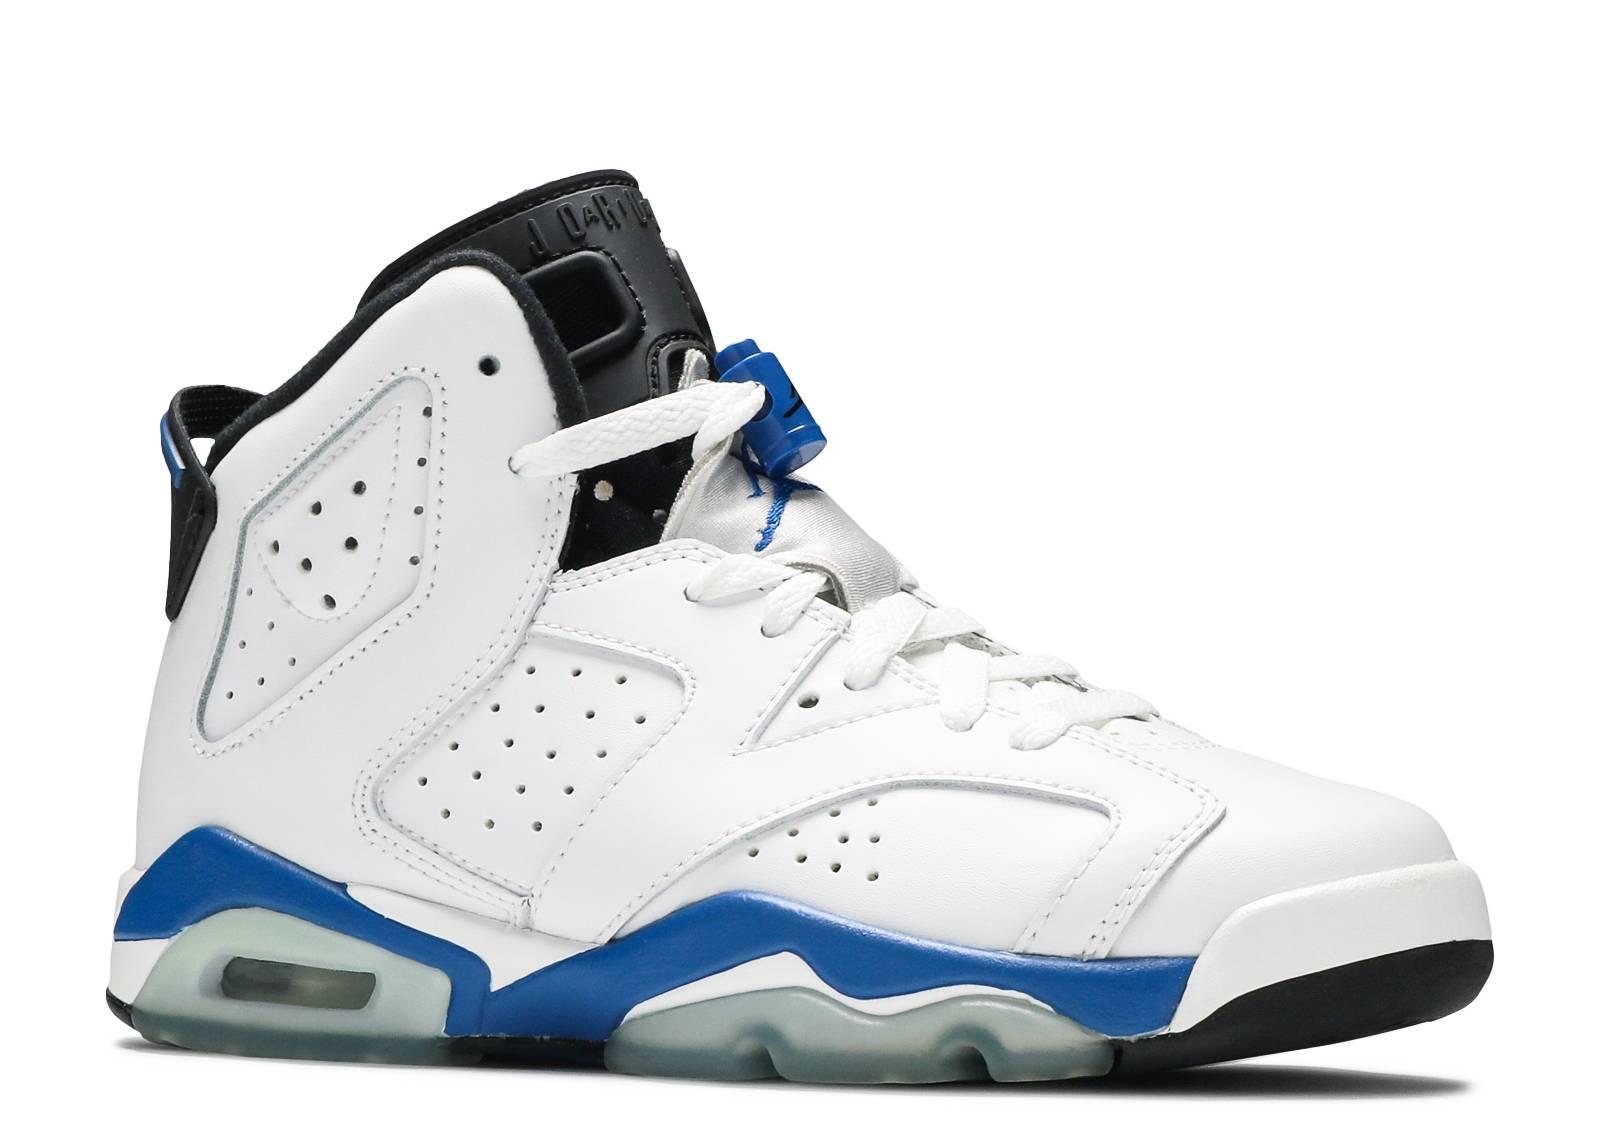 jordan blue and white 6